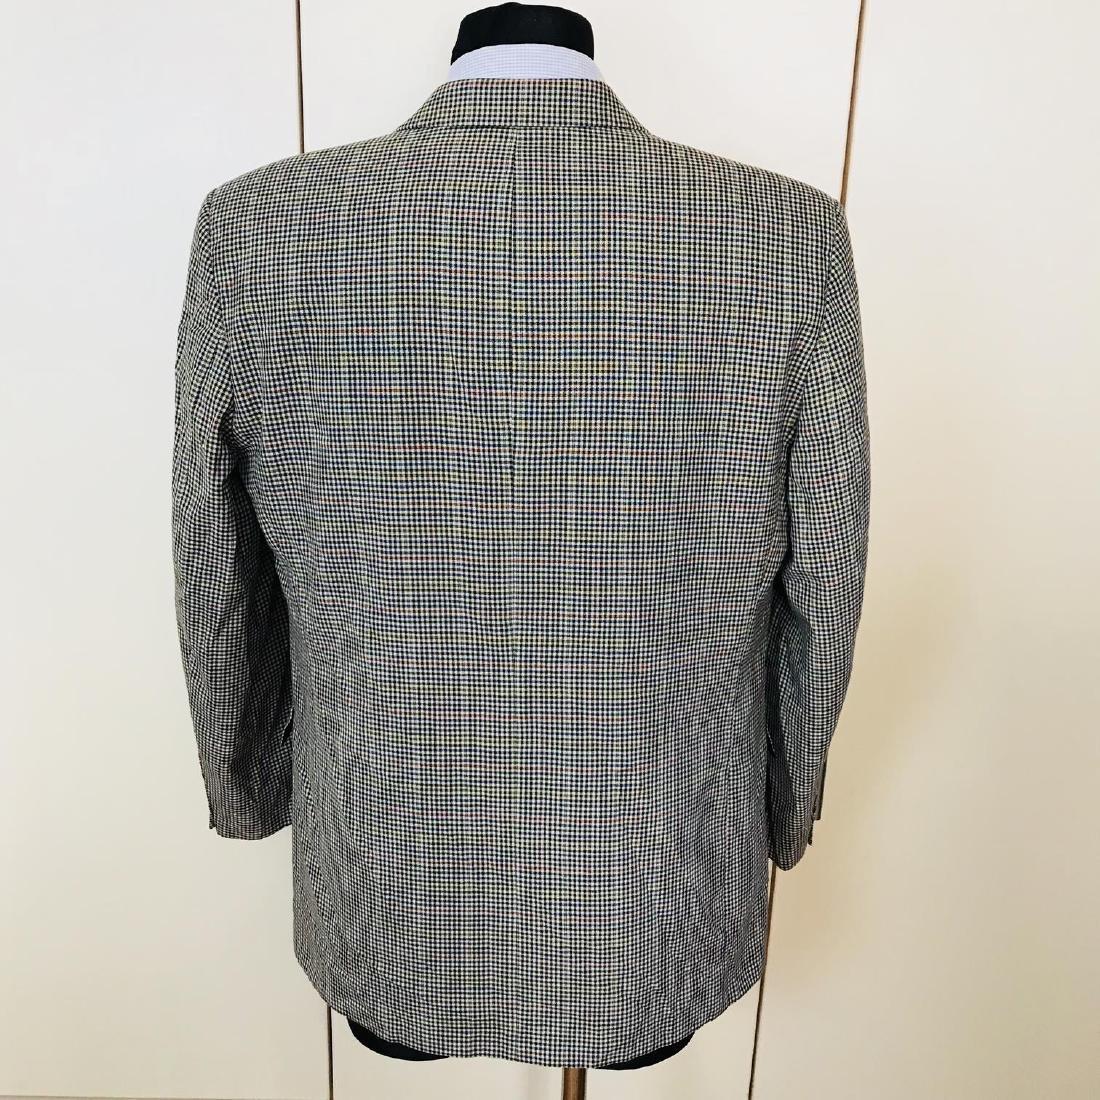 Vintage Men's Paolo Negrato Jacket Blazer Size US 40 - 4